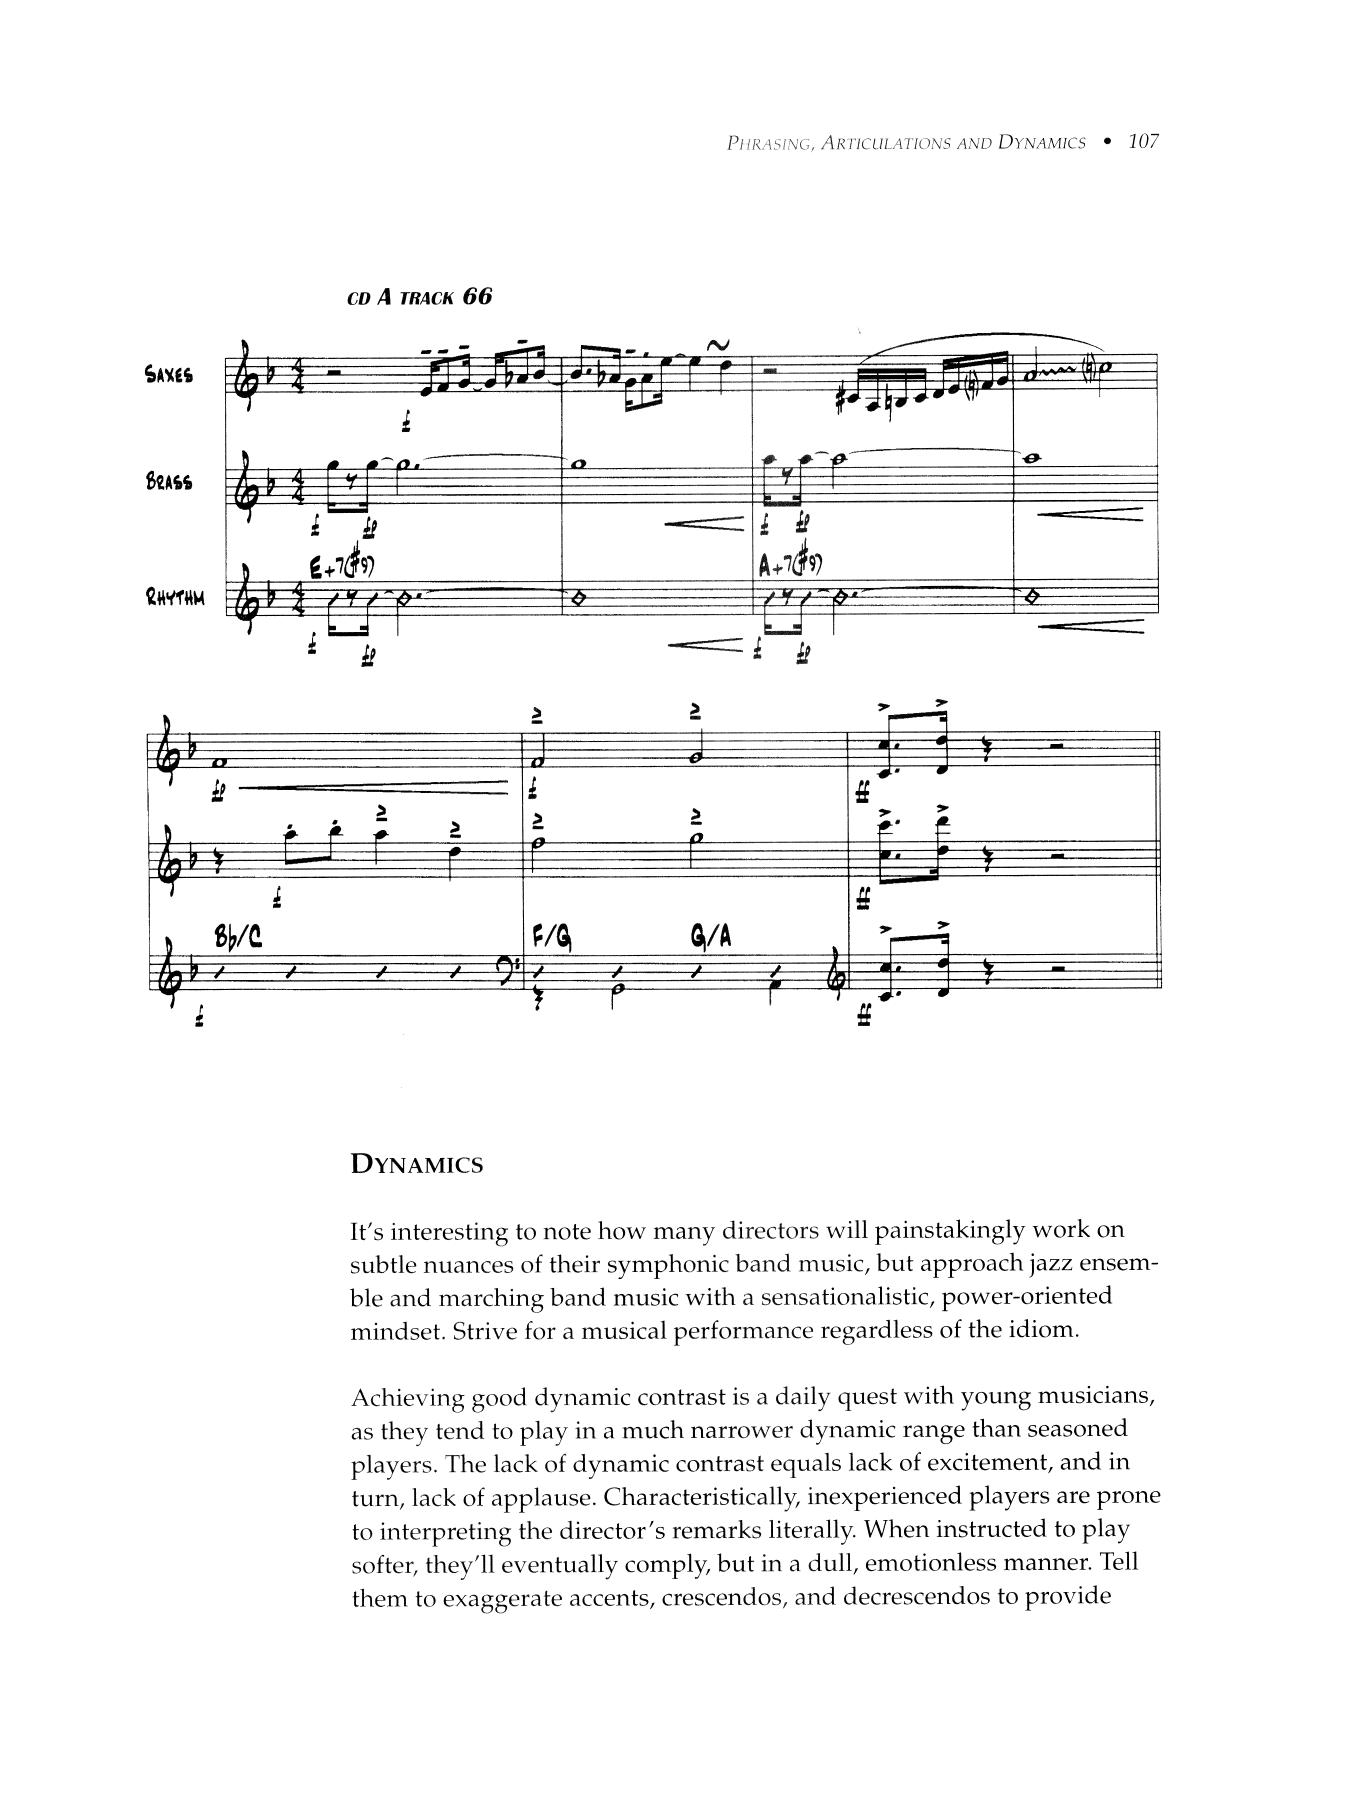 The Jazz Educator's Handbook - Part 2 Sheet Music